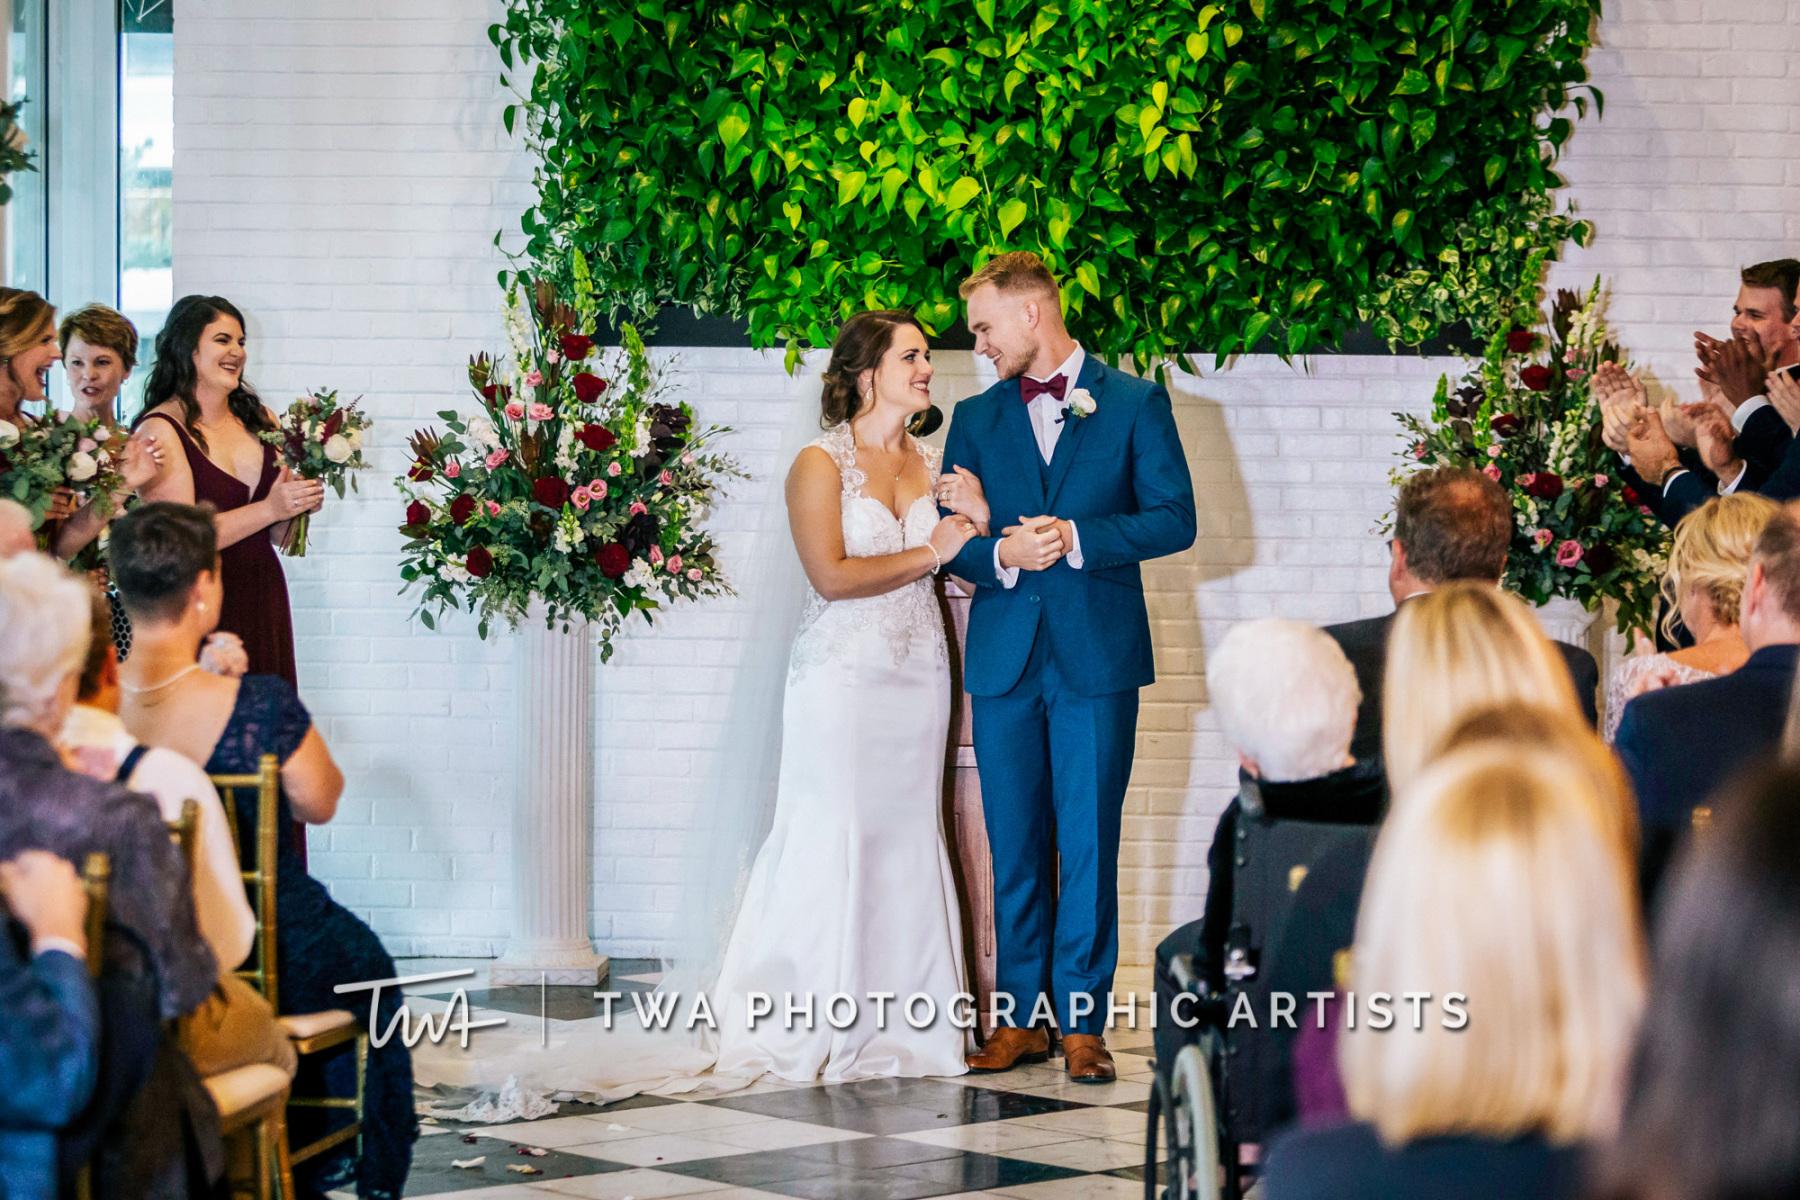 Chicago-Wedding-Photographer-TWA-Photographic-Artists-046_064-1153